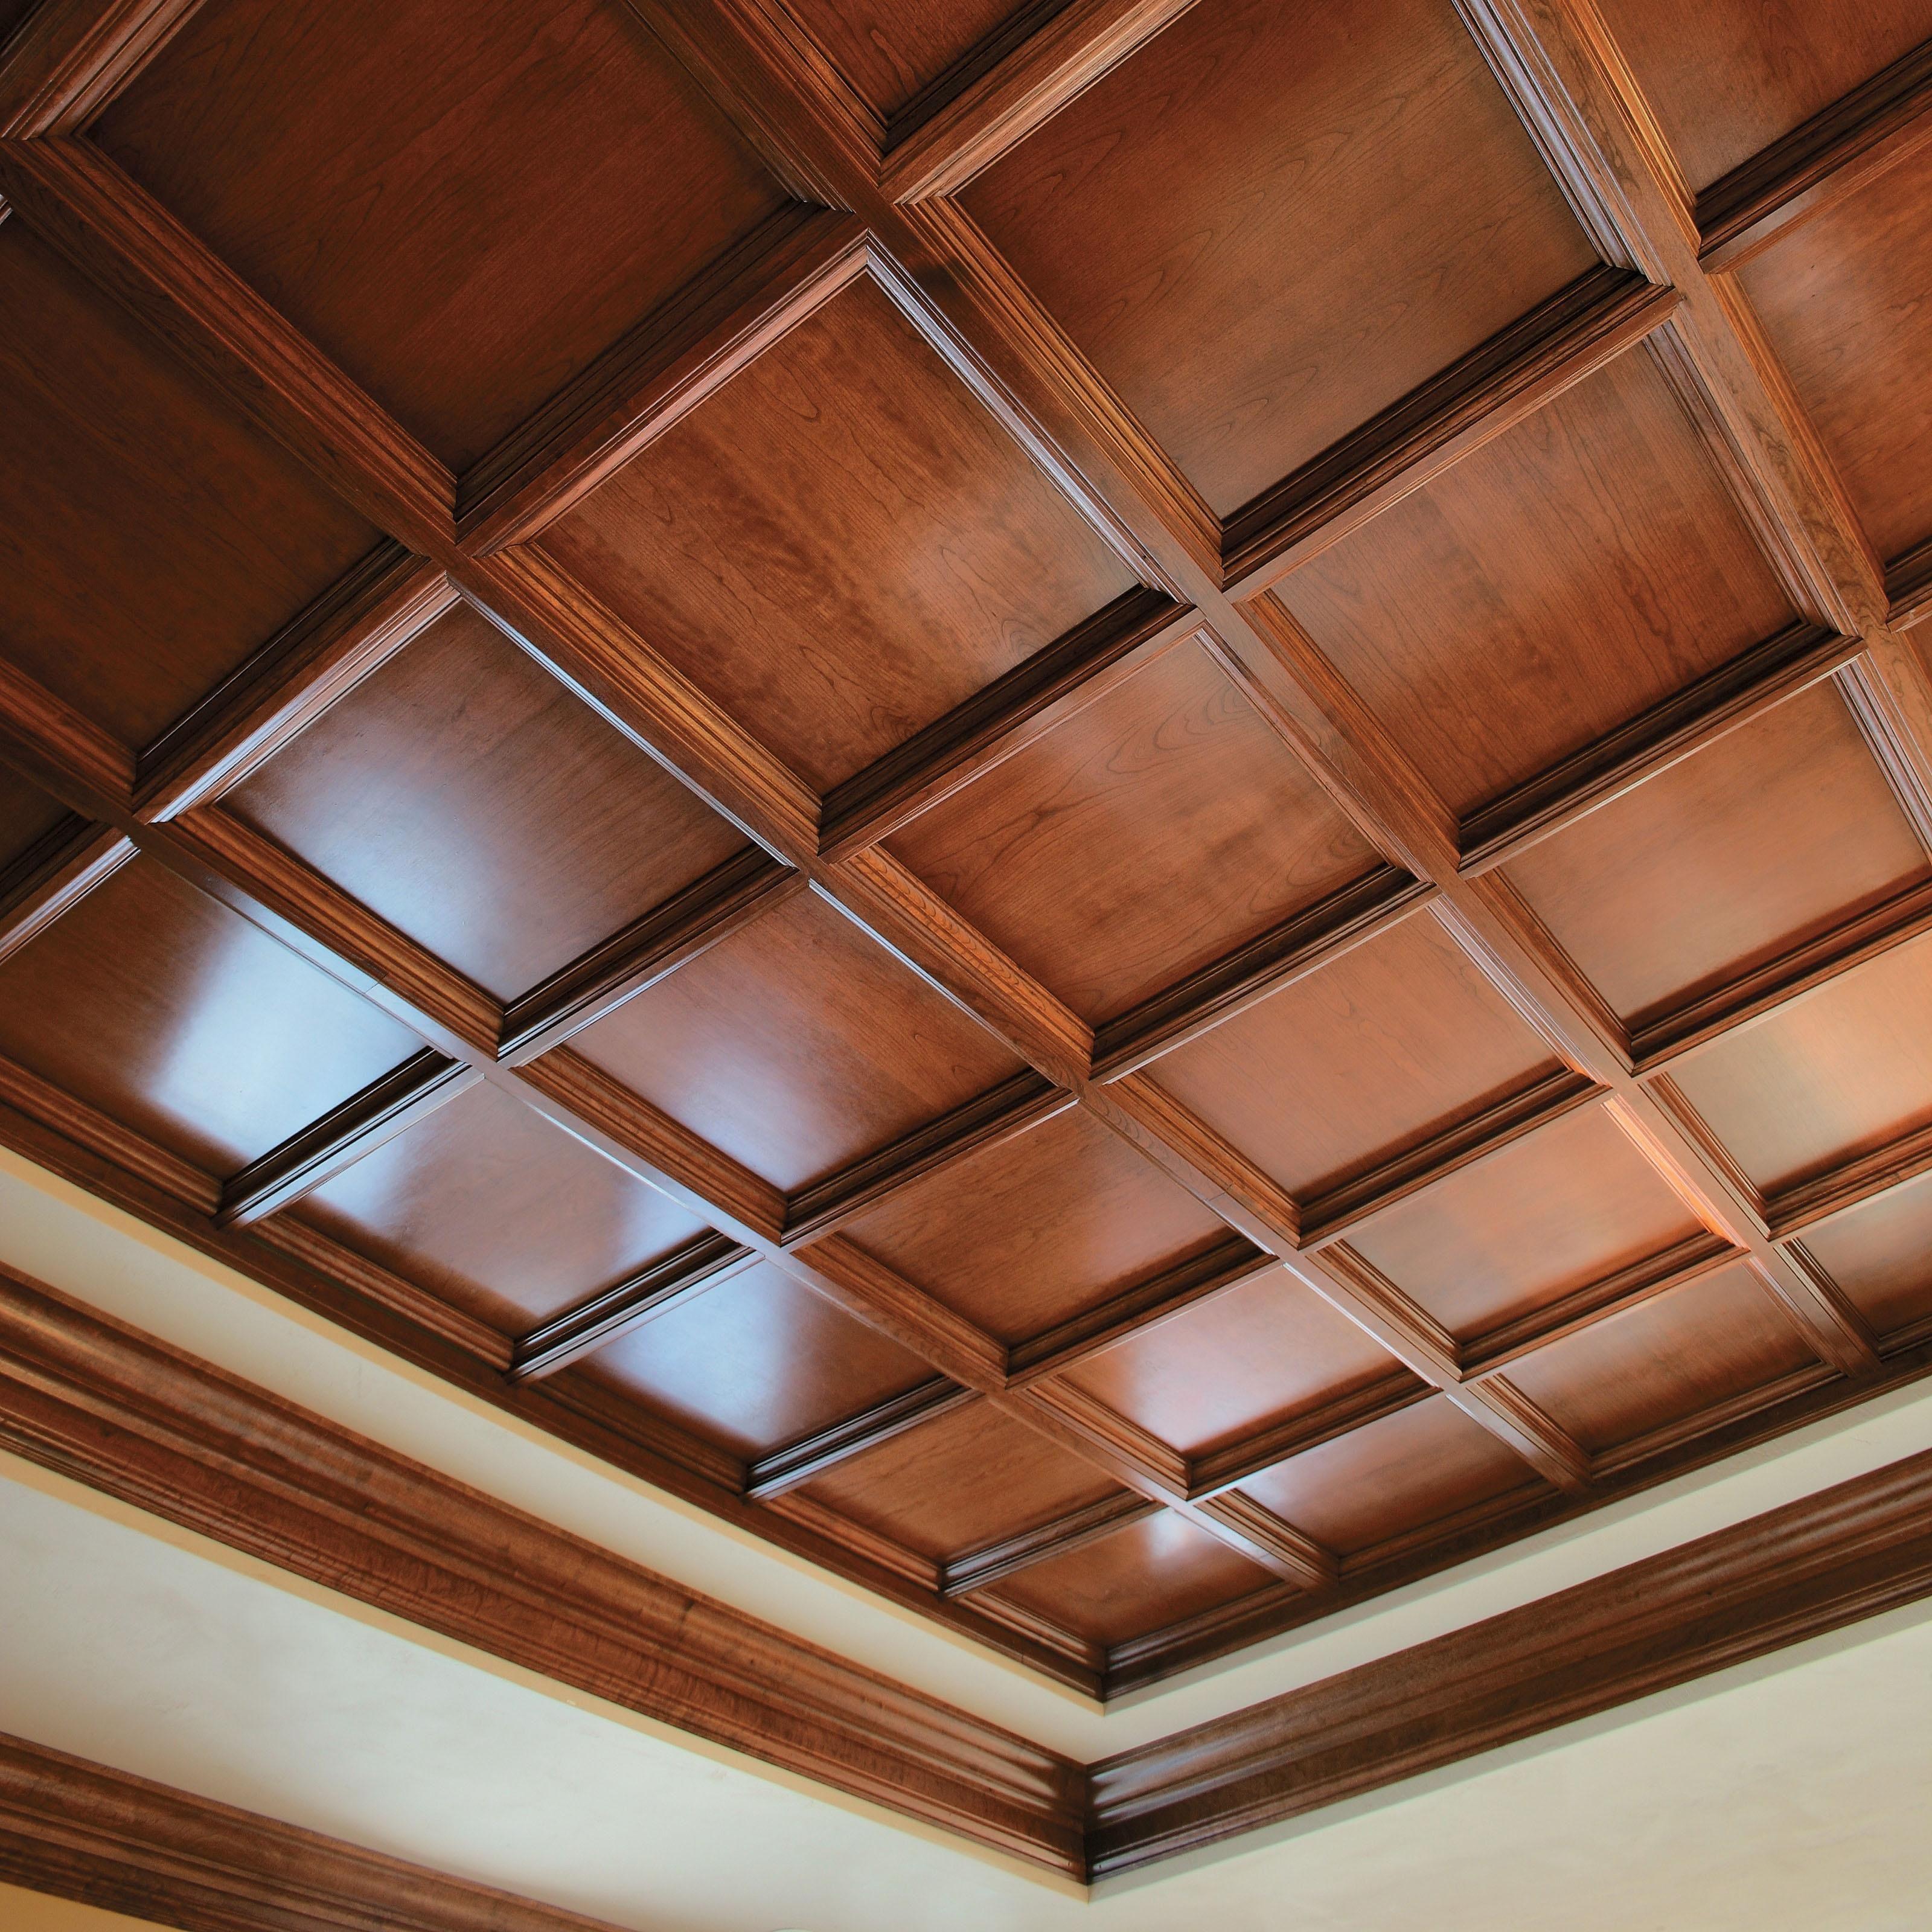 Fabulous Wood Drop Ceiling Tile Idea In Teak Wood Finish